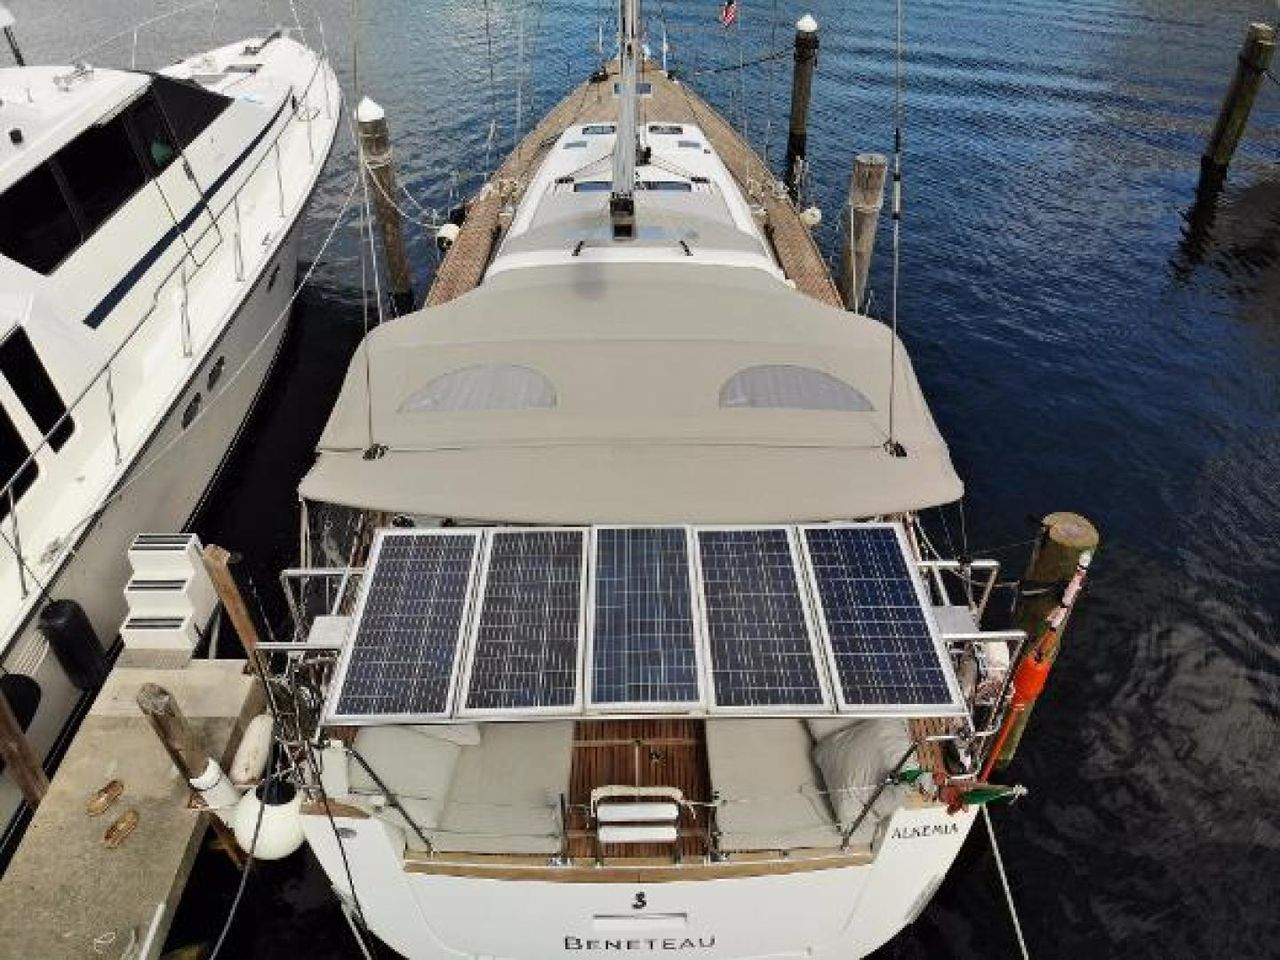 2016 Used Beneteau Oceanis 60 Cruiser Sailboat For Sale